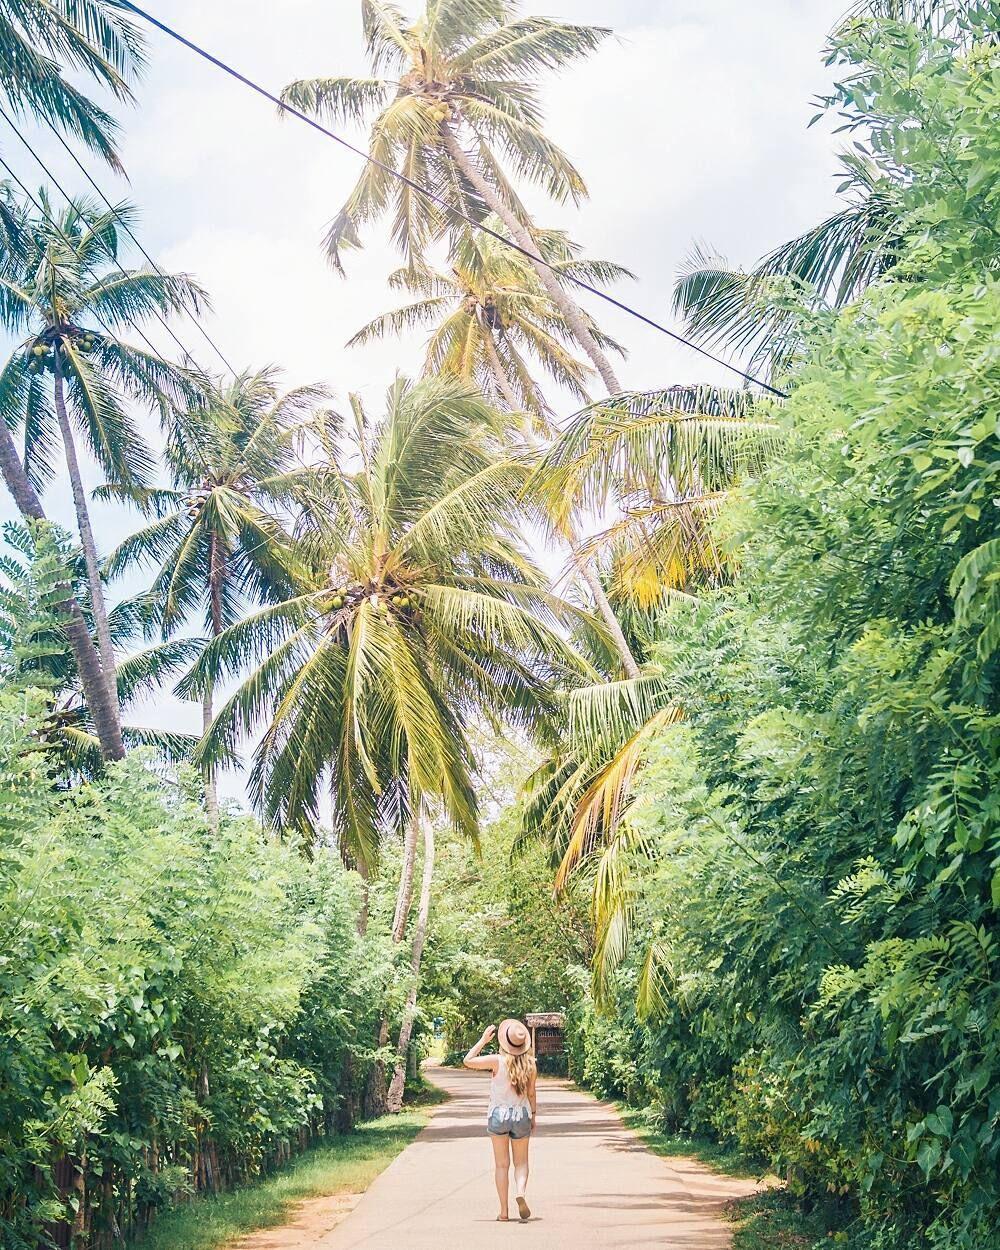 Tangale, Sri Lanka